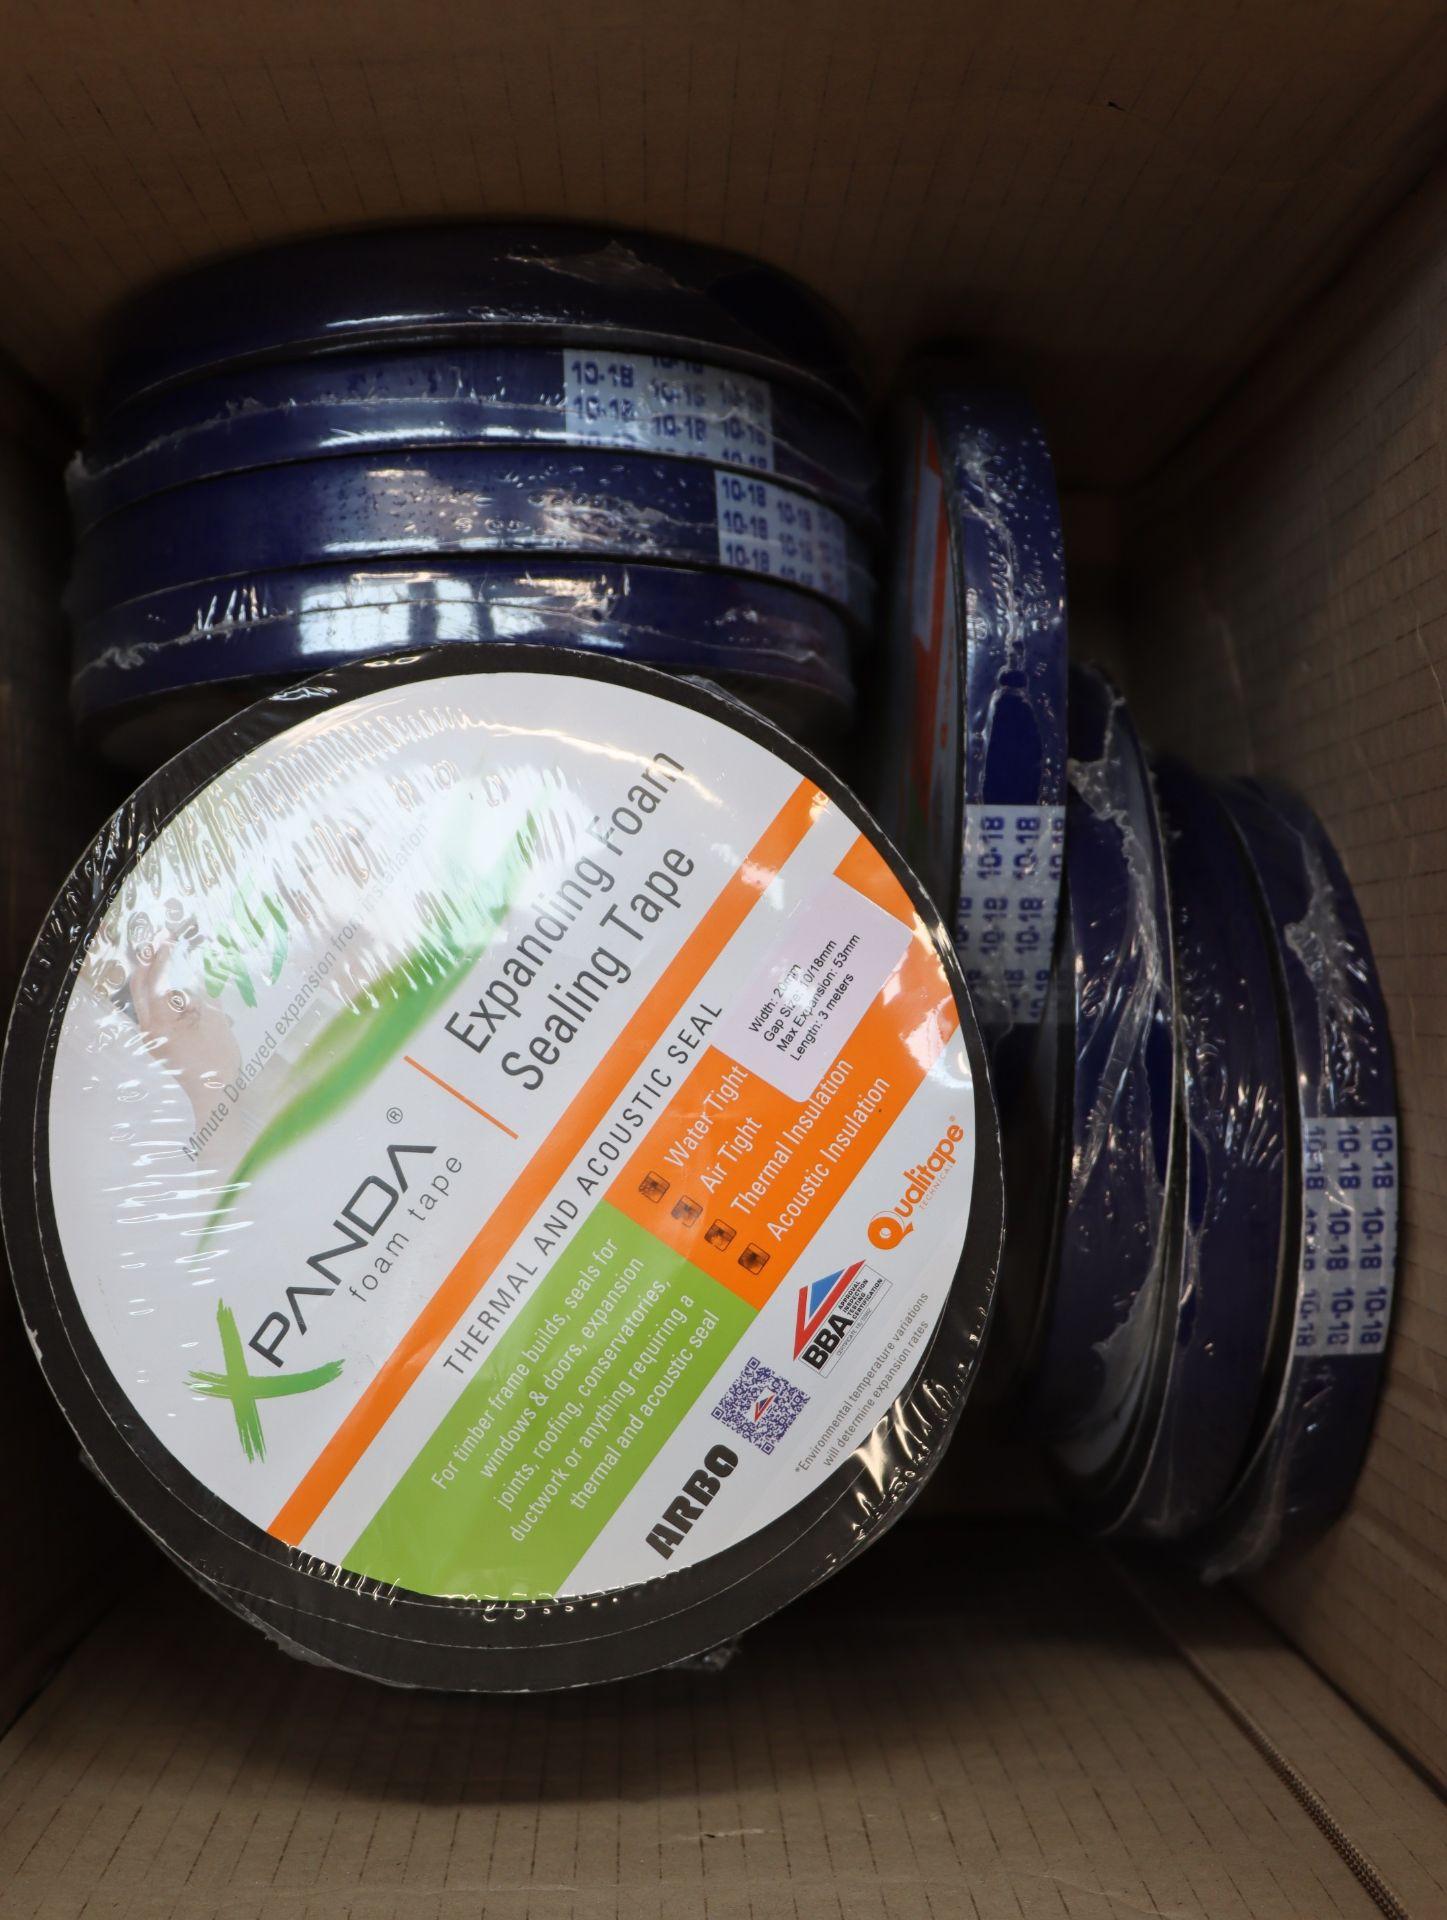 Lot 773 - Eigteen rolls of Expanda expanding foam sealing tape (10mm-53mm, 3m rolls).